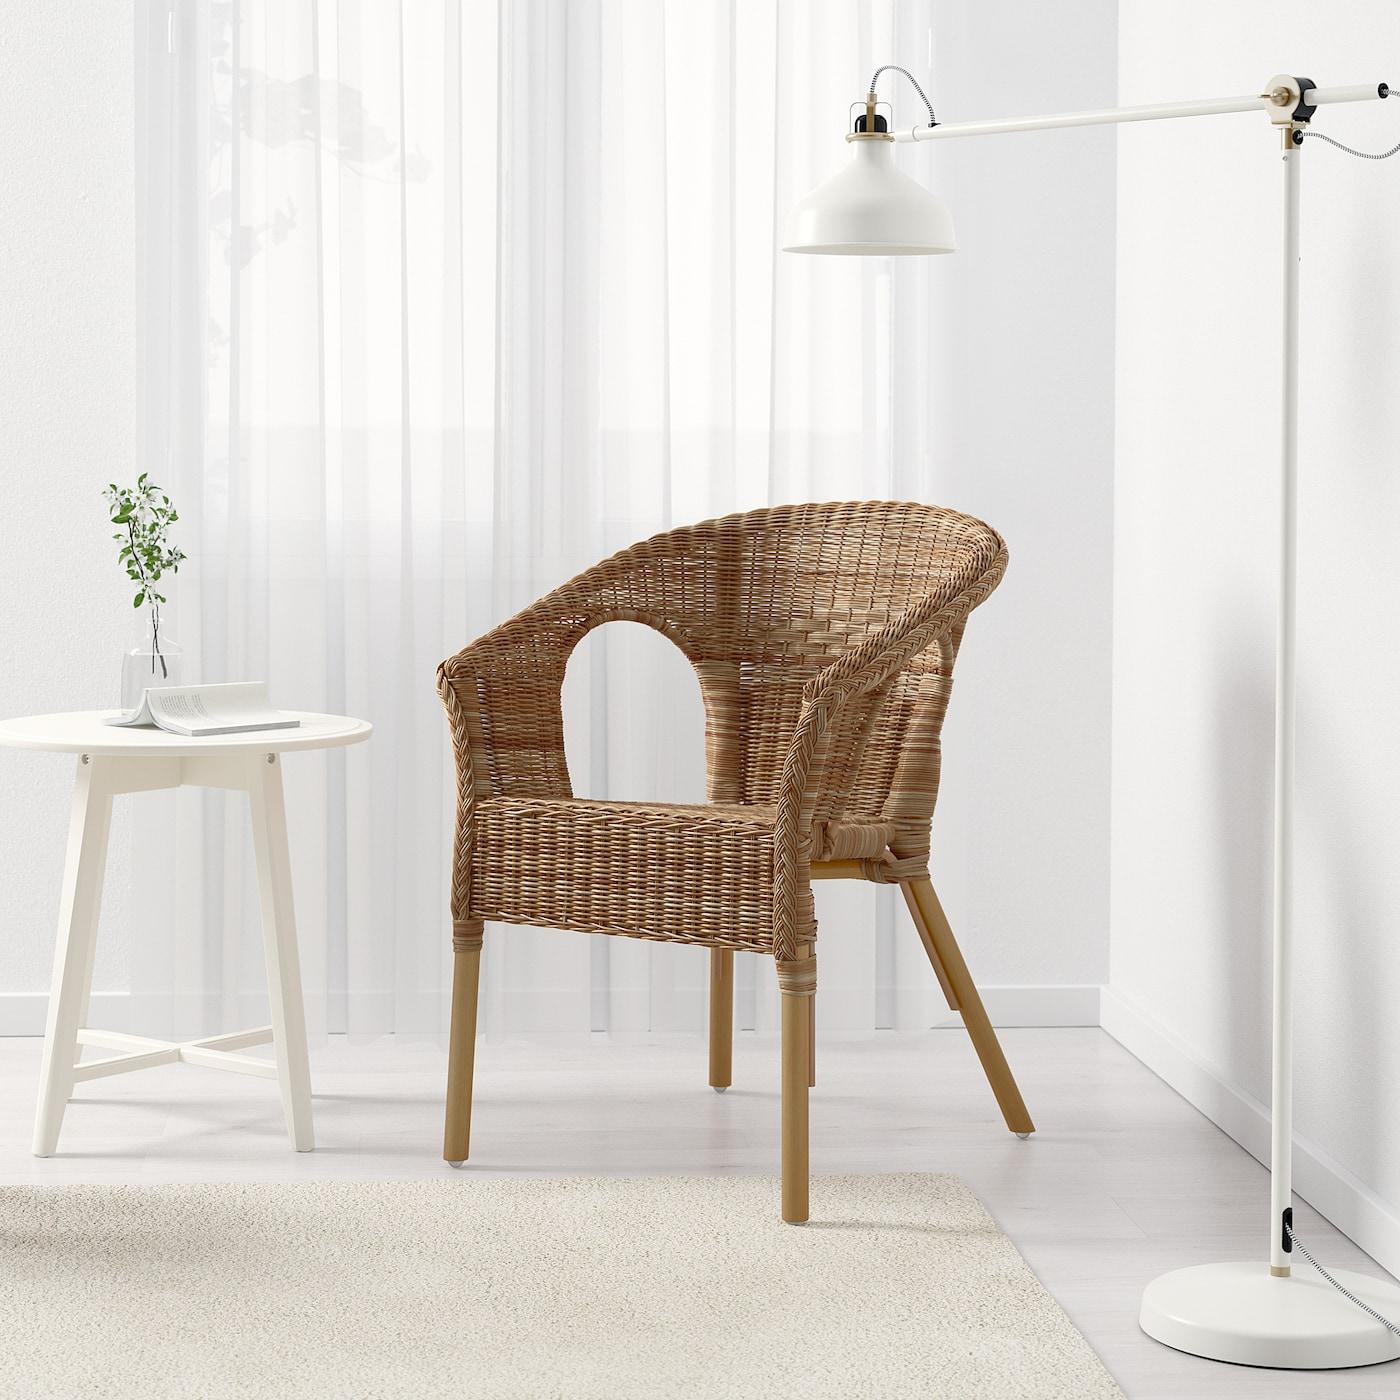 Ikea Mobili In Vimini agen poltrona - rattan, bambù